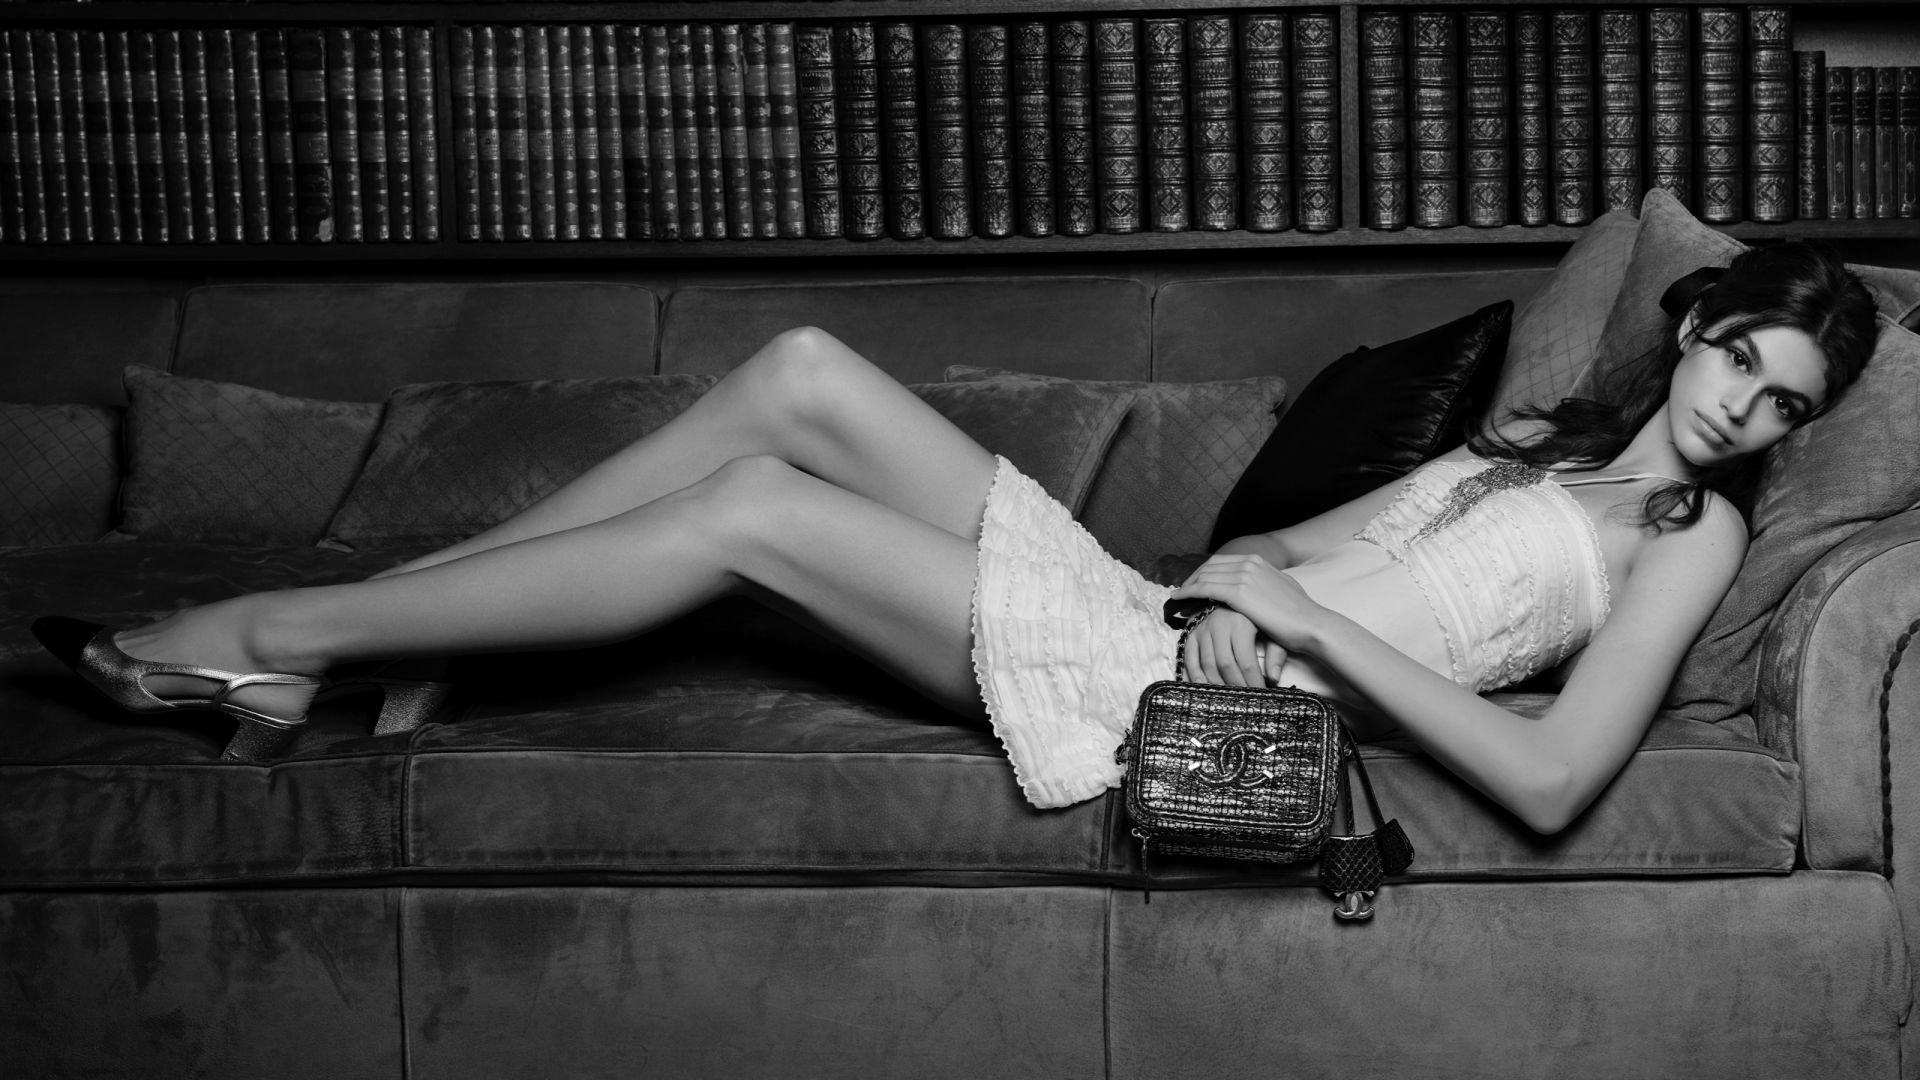 chanel handbag stories Esprit de Gabrielle espritdegabrielle.com